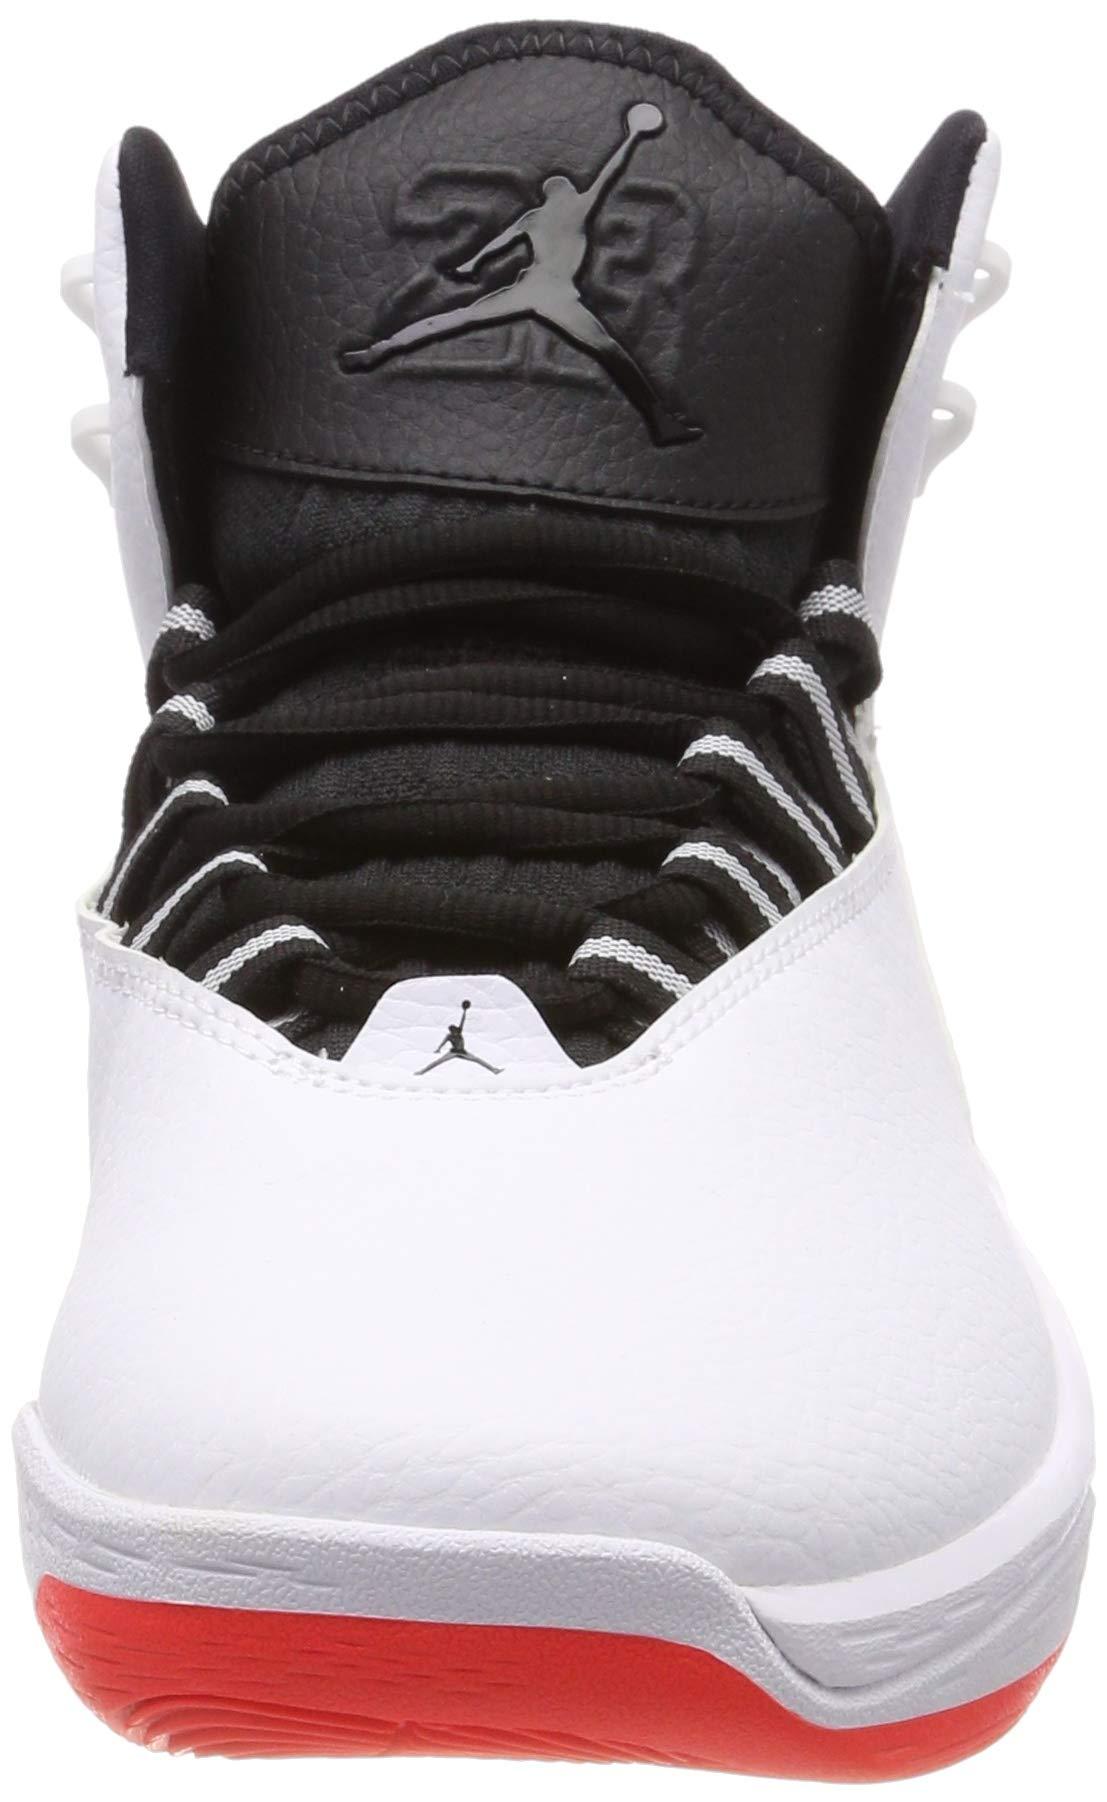 fly Da Basket Nike Uomo Jordan Super MvpScarpe vym0wN8nO